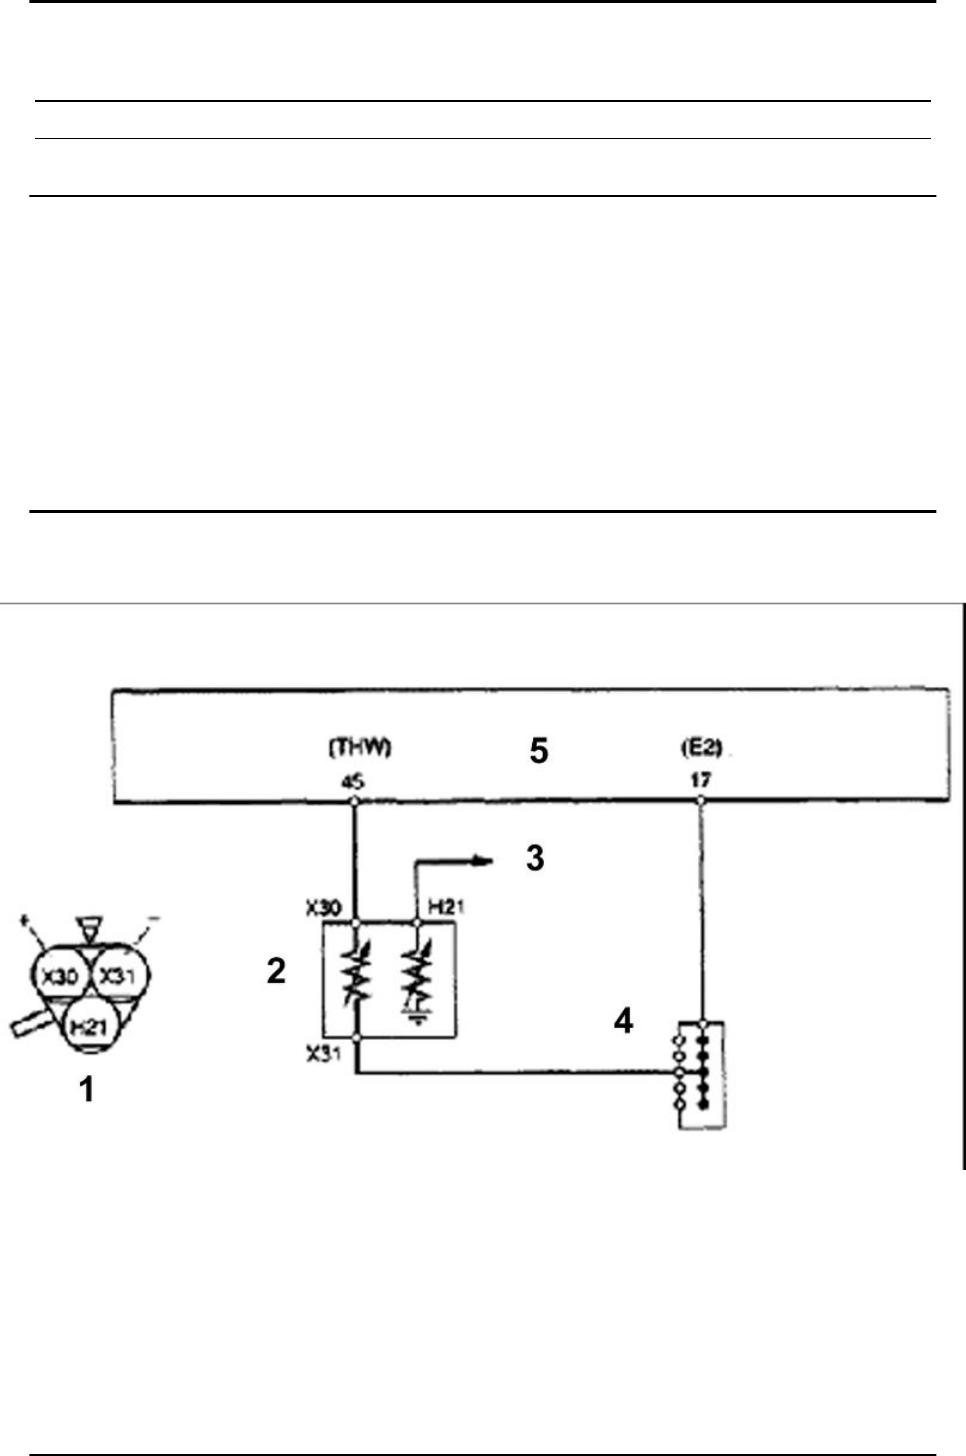 Tm 3197 Daihatsu Hijet Spark Plugs On Daihatsu Hijet Engine Wiring Diagram Schematic Wiring